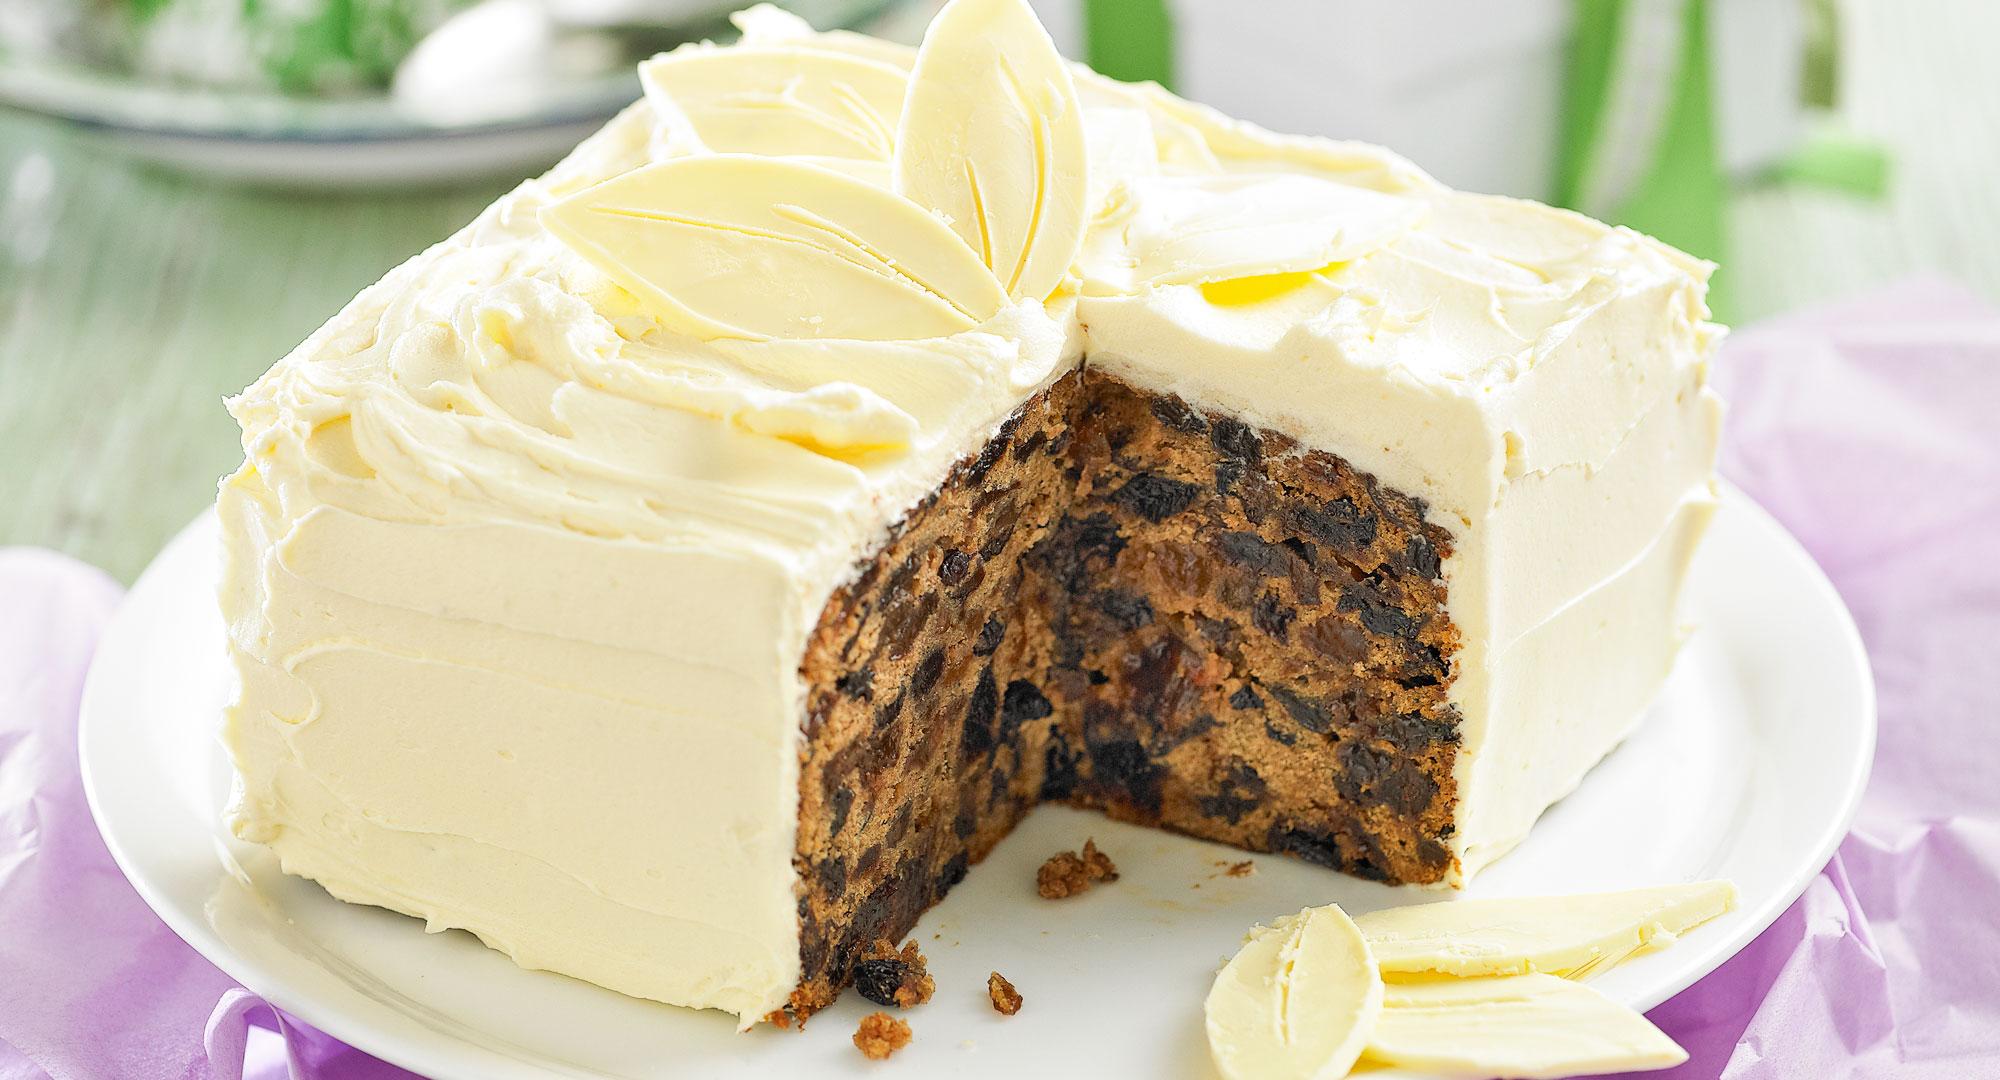 Better Homes And Gardens Chocolate Cake Recipe